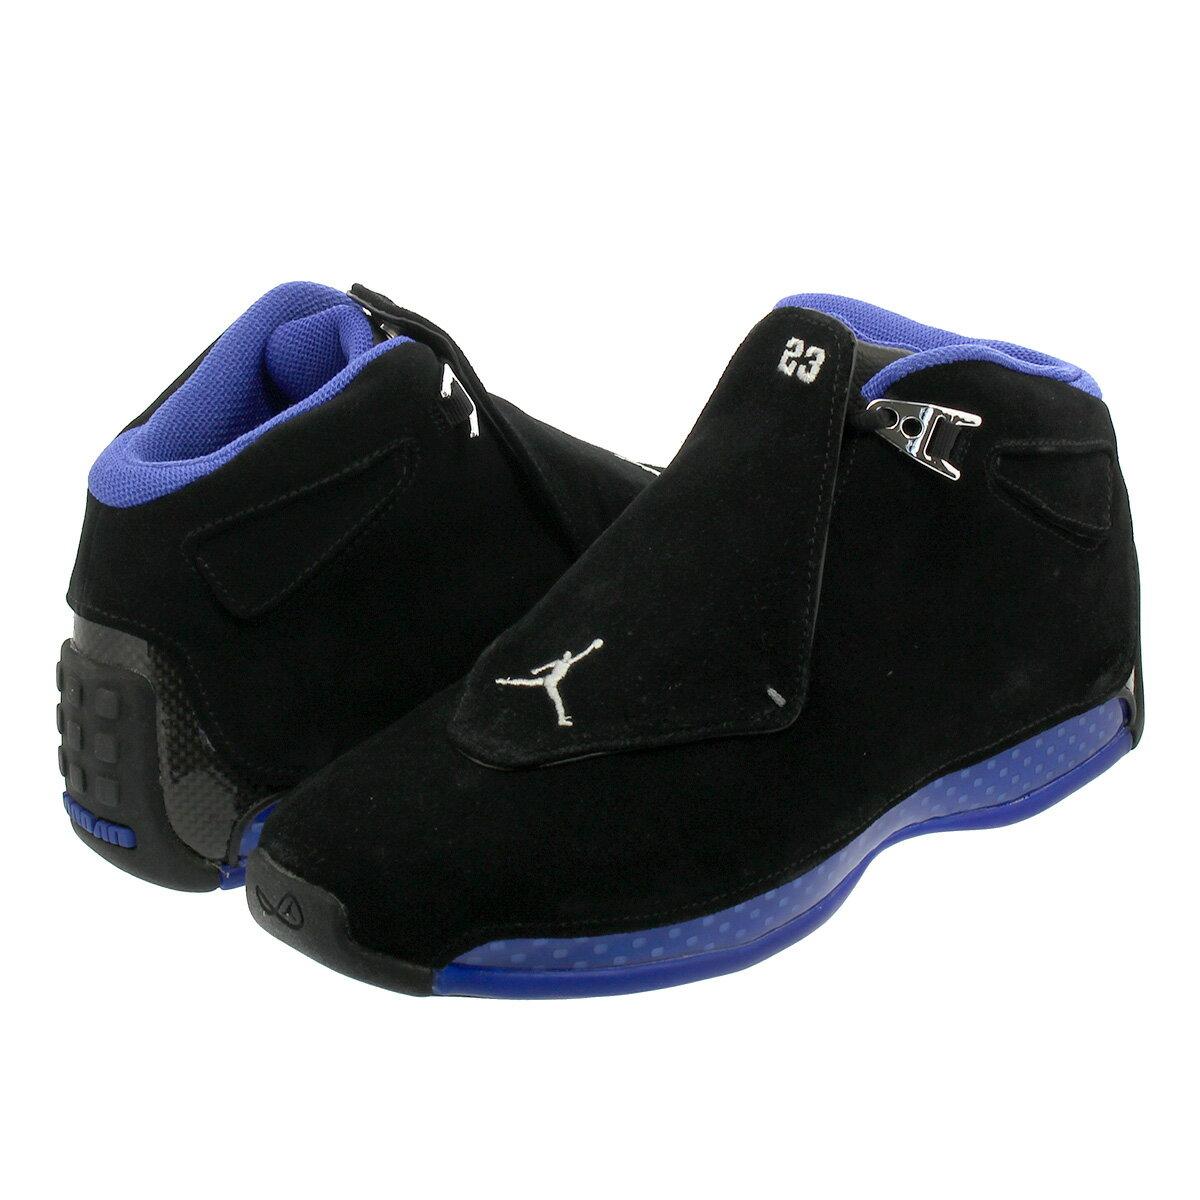 NIKE AIR JORDAN 18 RETRO Nike Air Jordan 18 nostalgic BLACKMETALLIC SILVERSPORT ROYAL aa2494 007